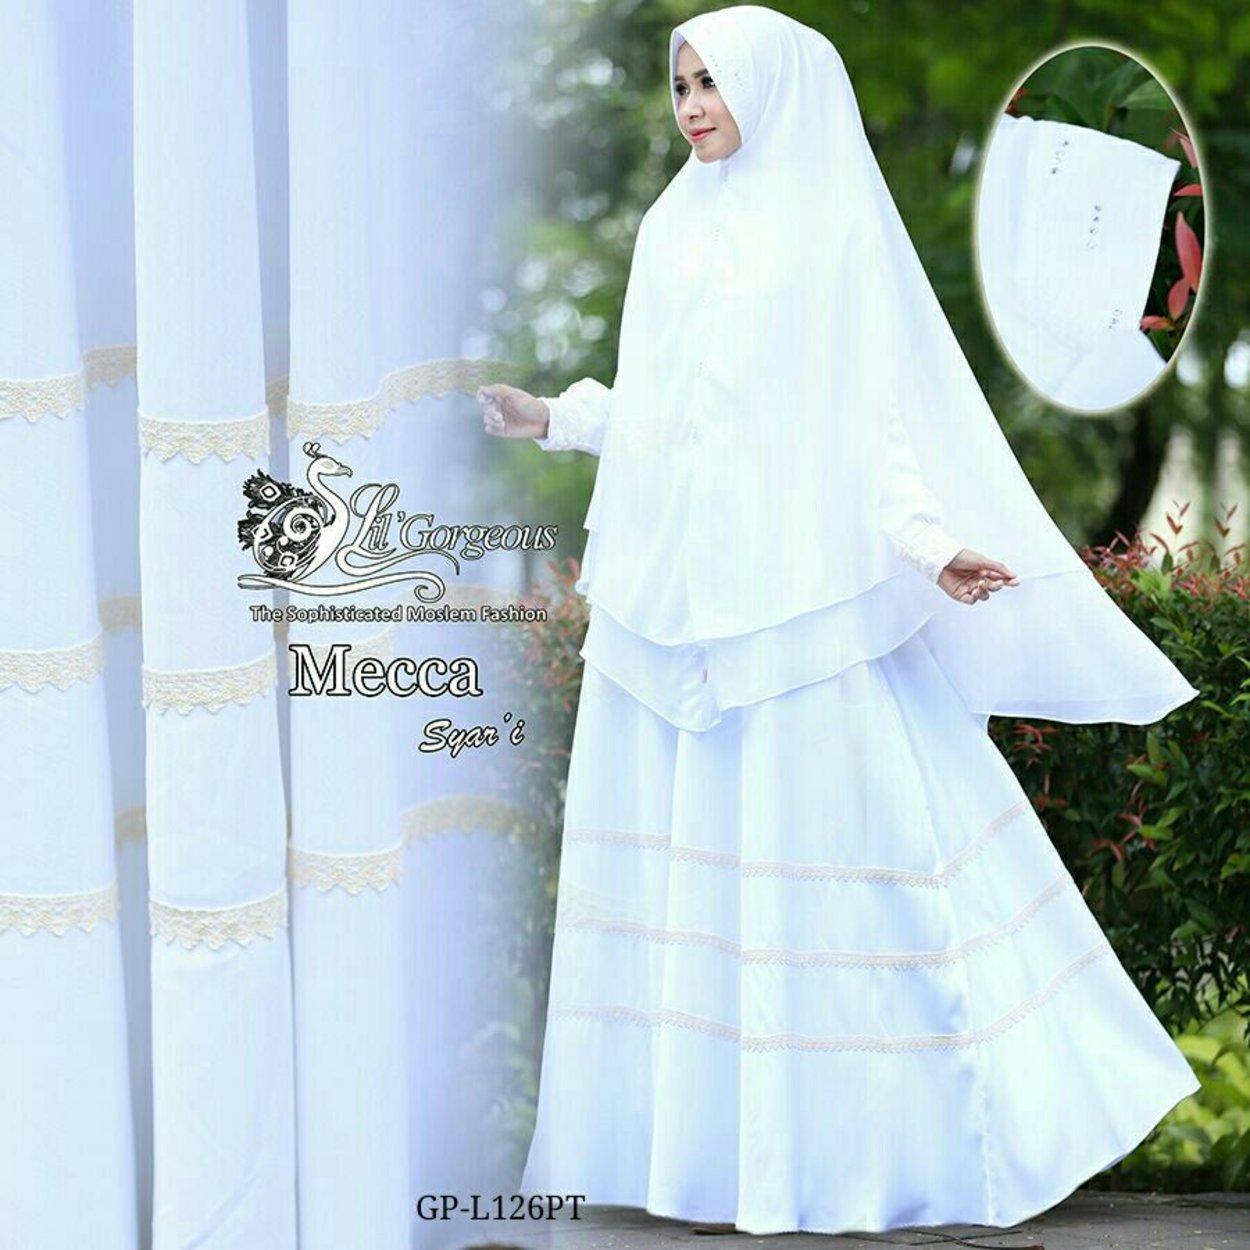 Mecca white